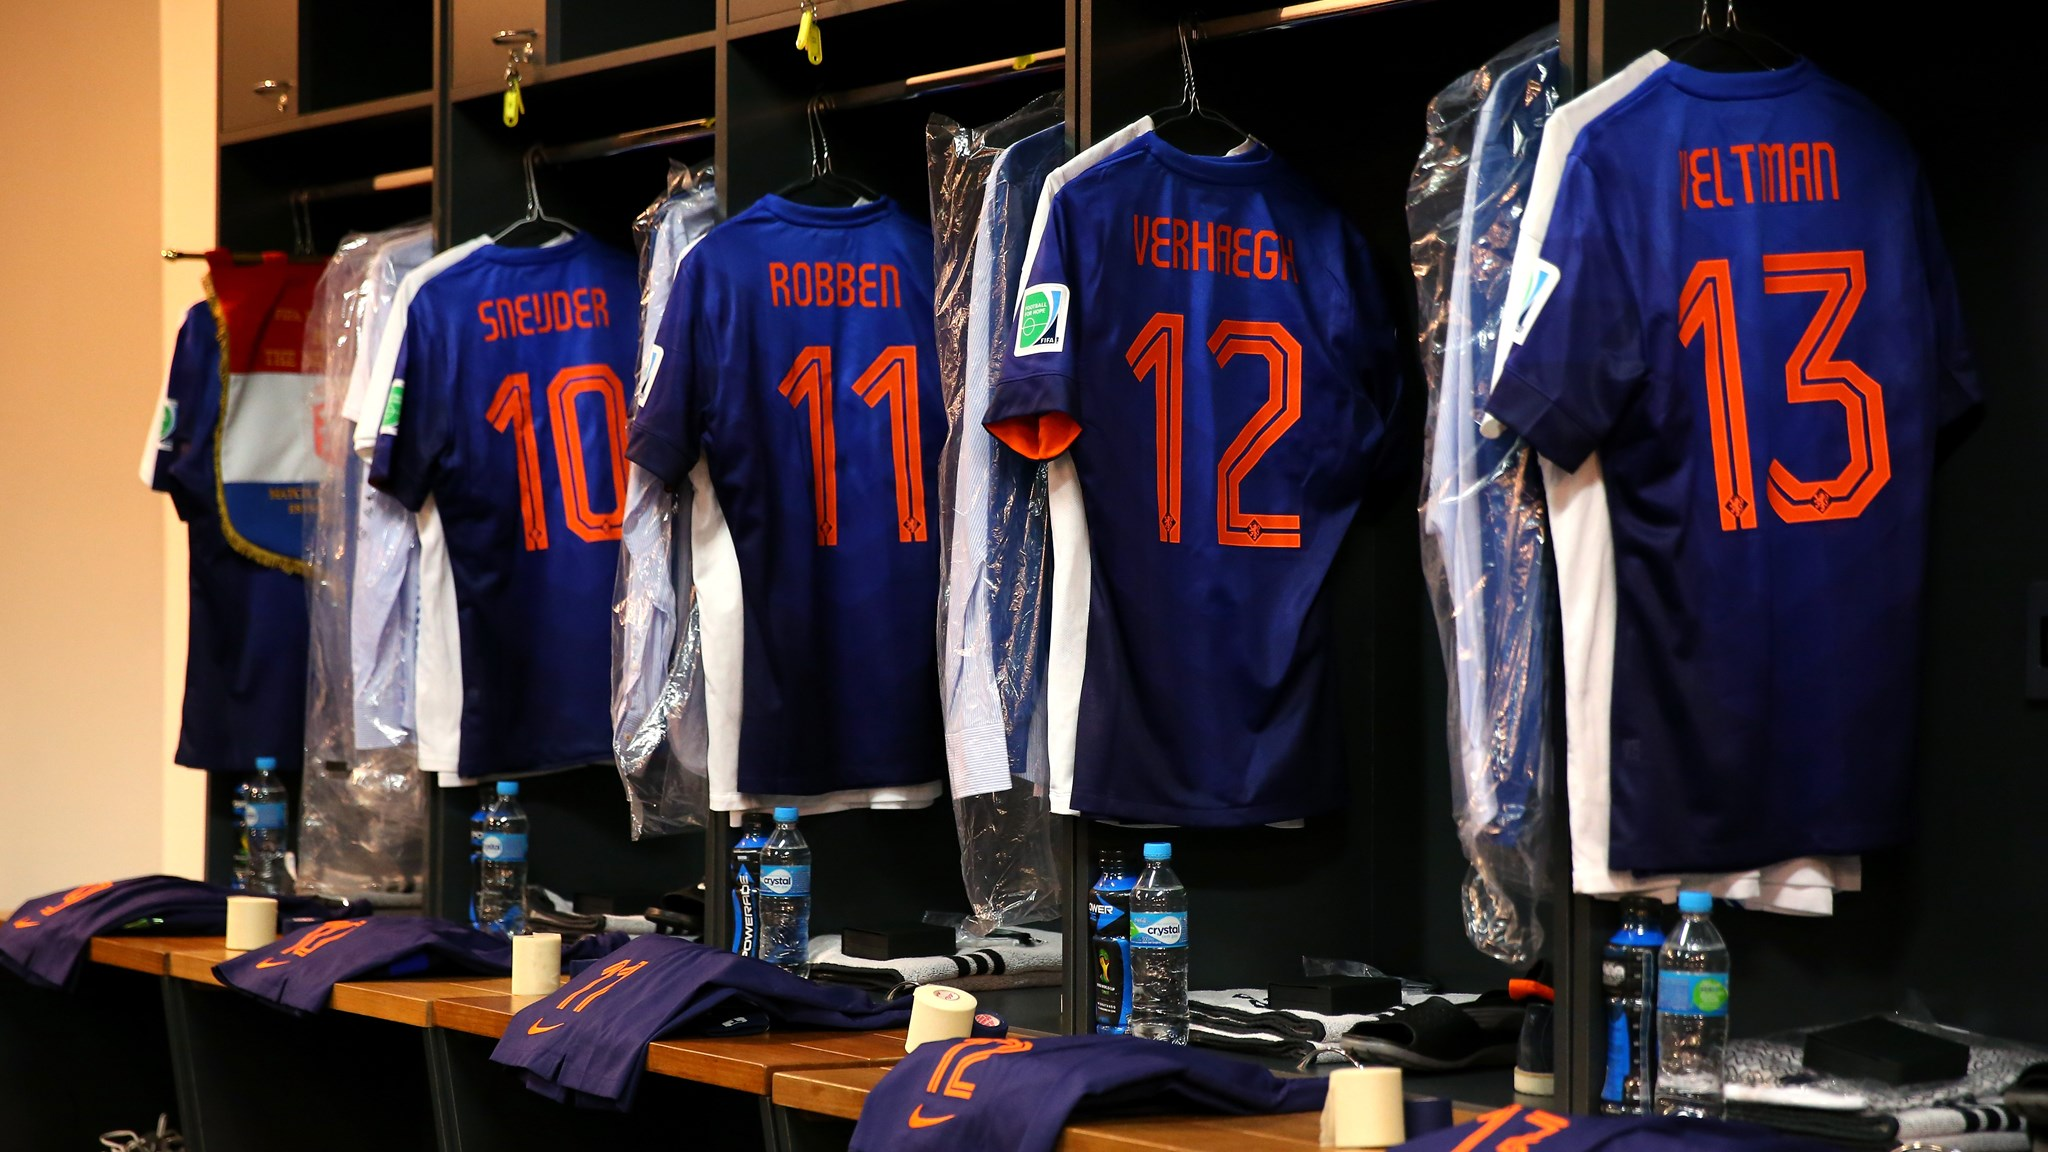 203 - Brazil-Netherlands [0-3] -- 12 Jul 2014 - 17-00 - kuaza